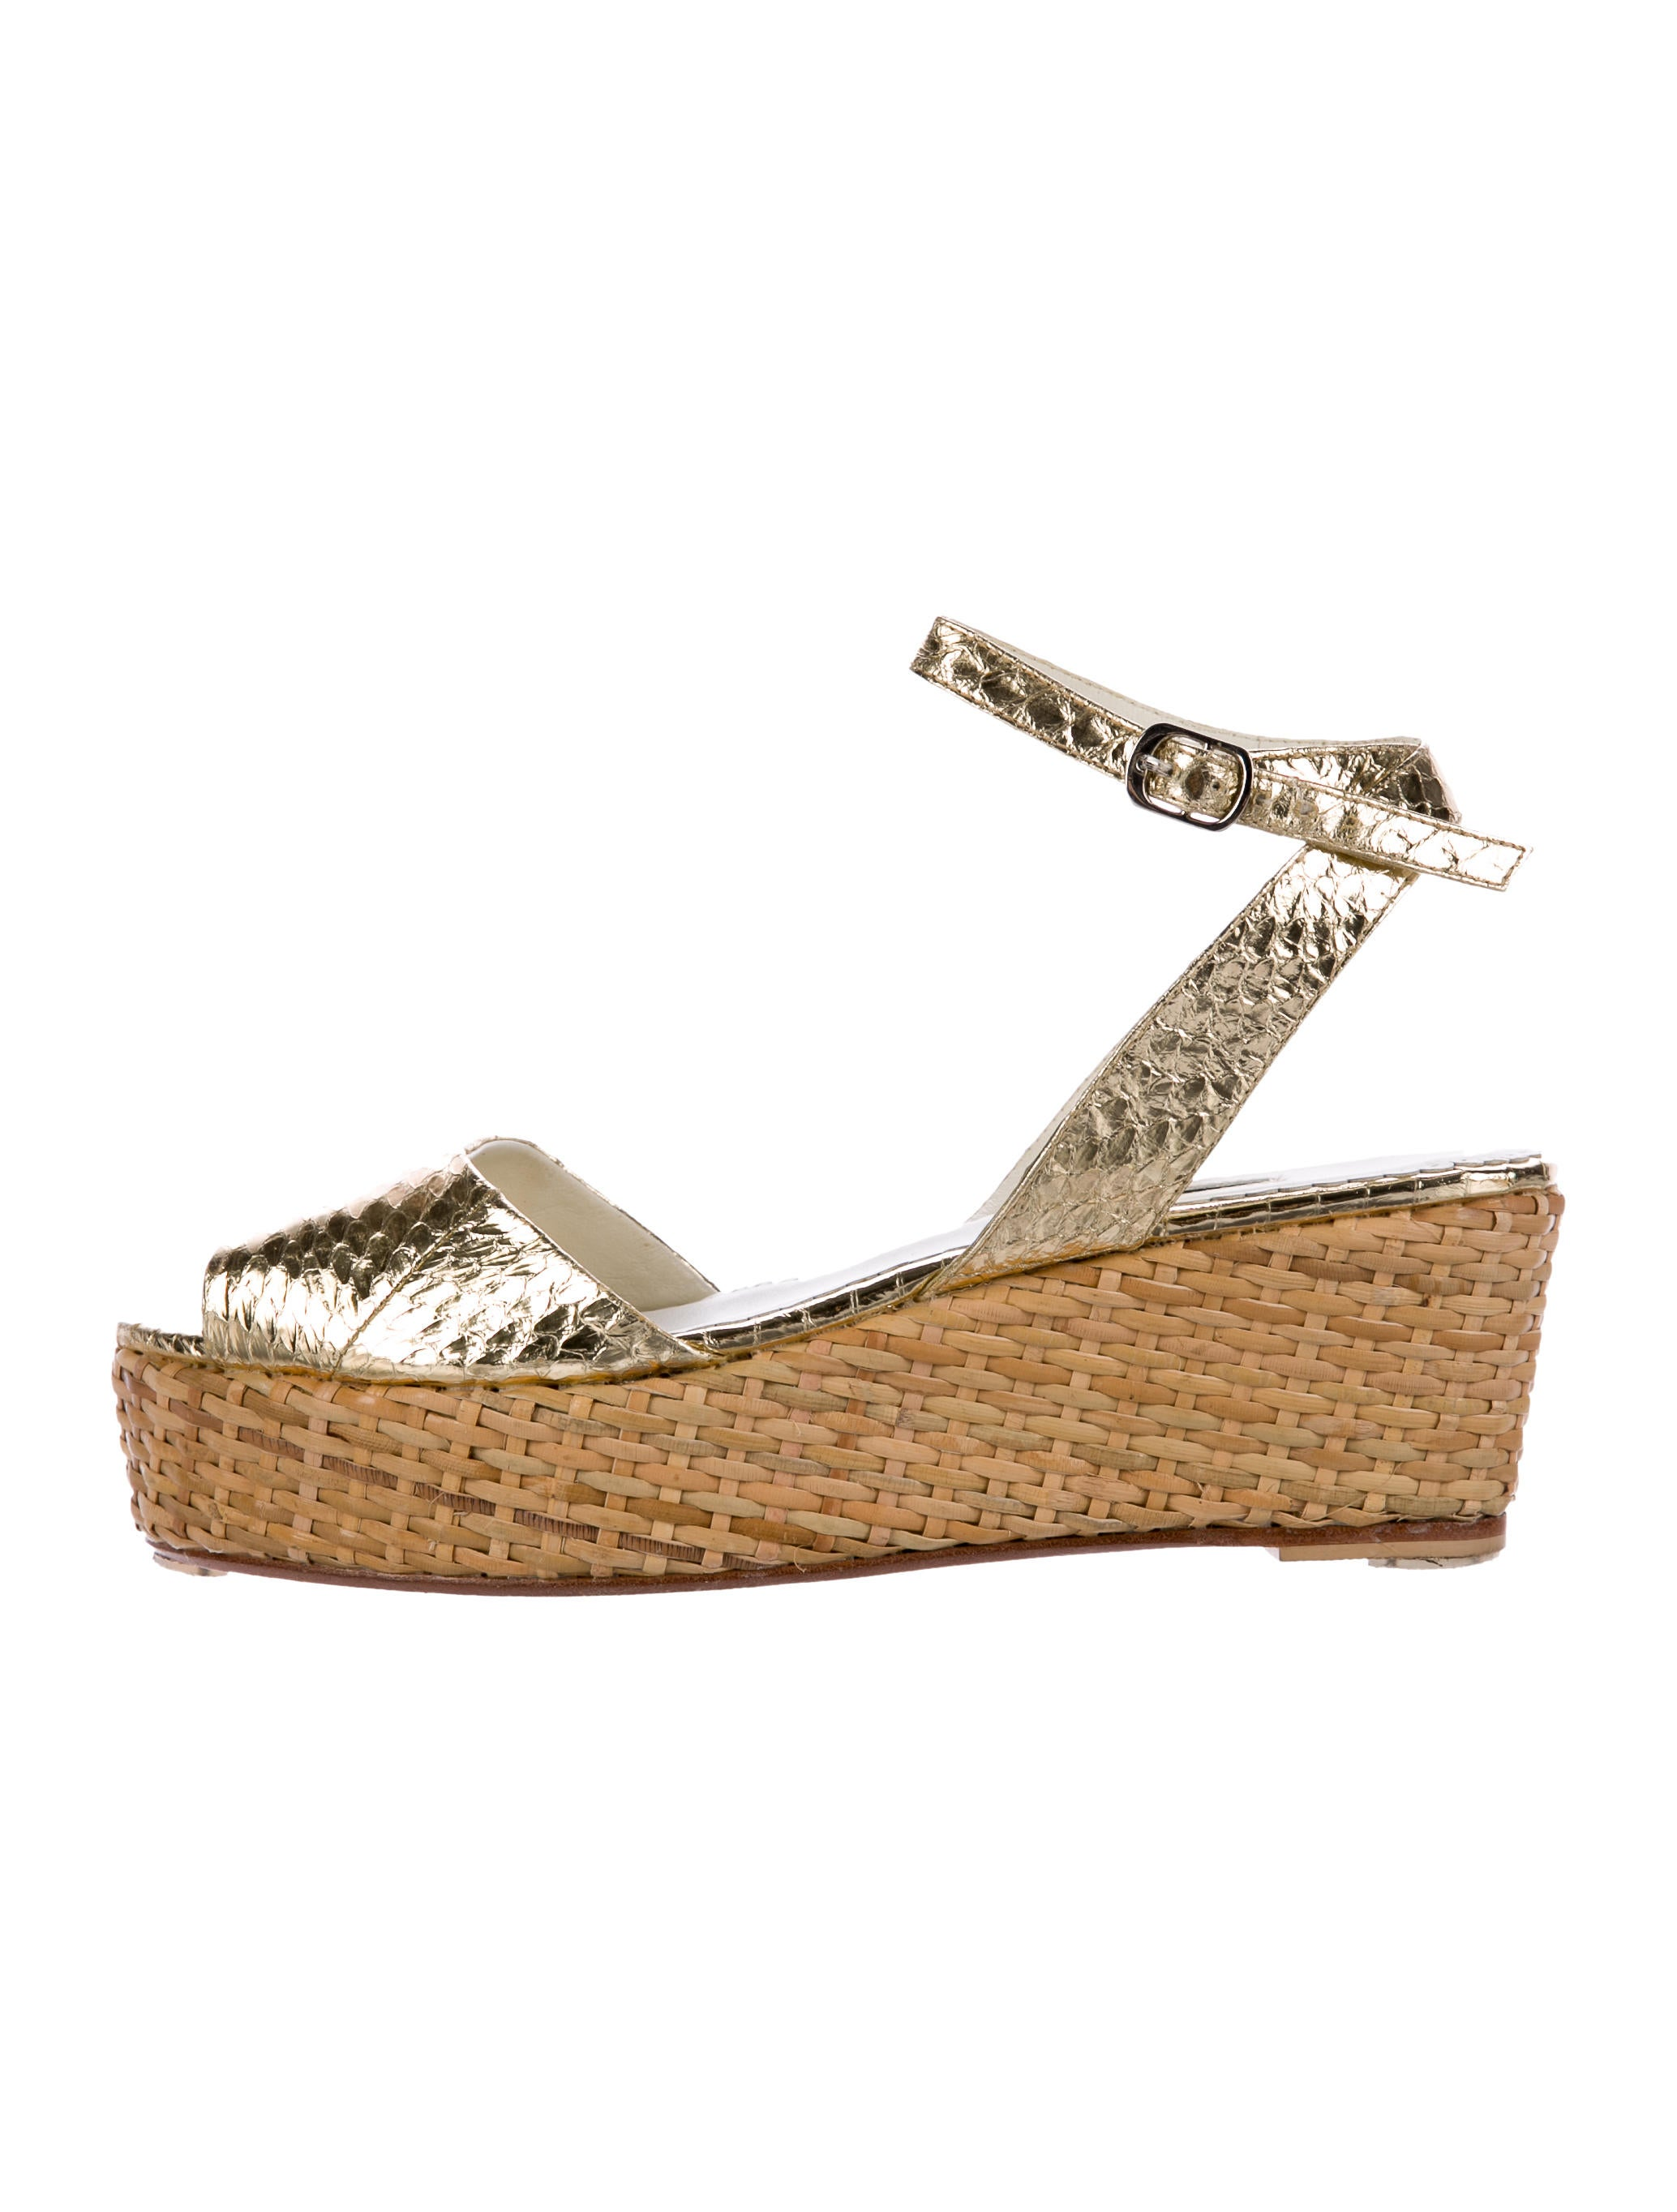 Rafe Snakeskin Wedge Sandals original cheap online DHnvbhU2ZW